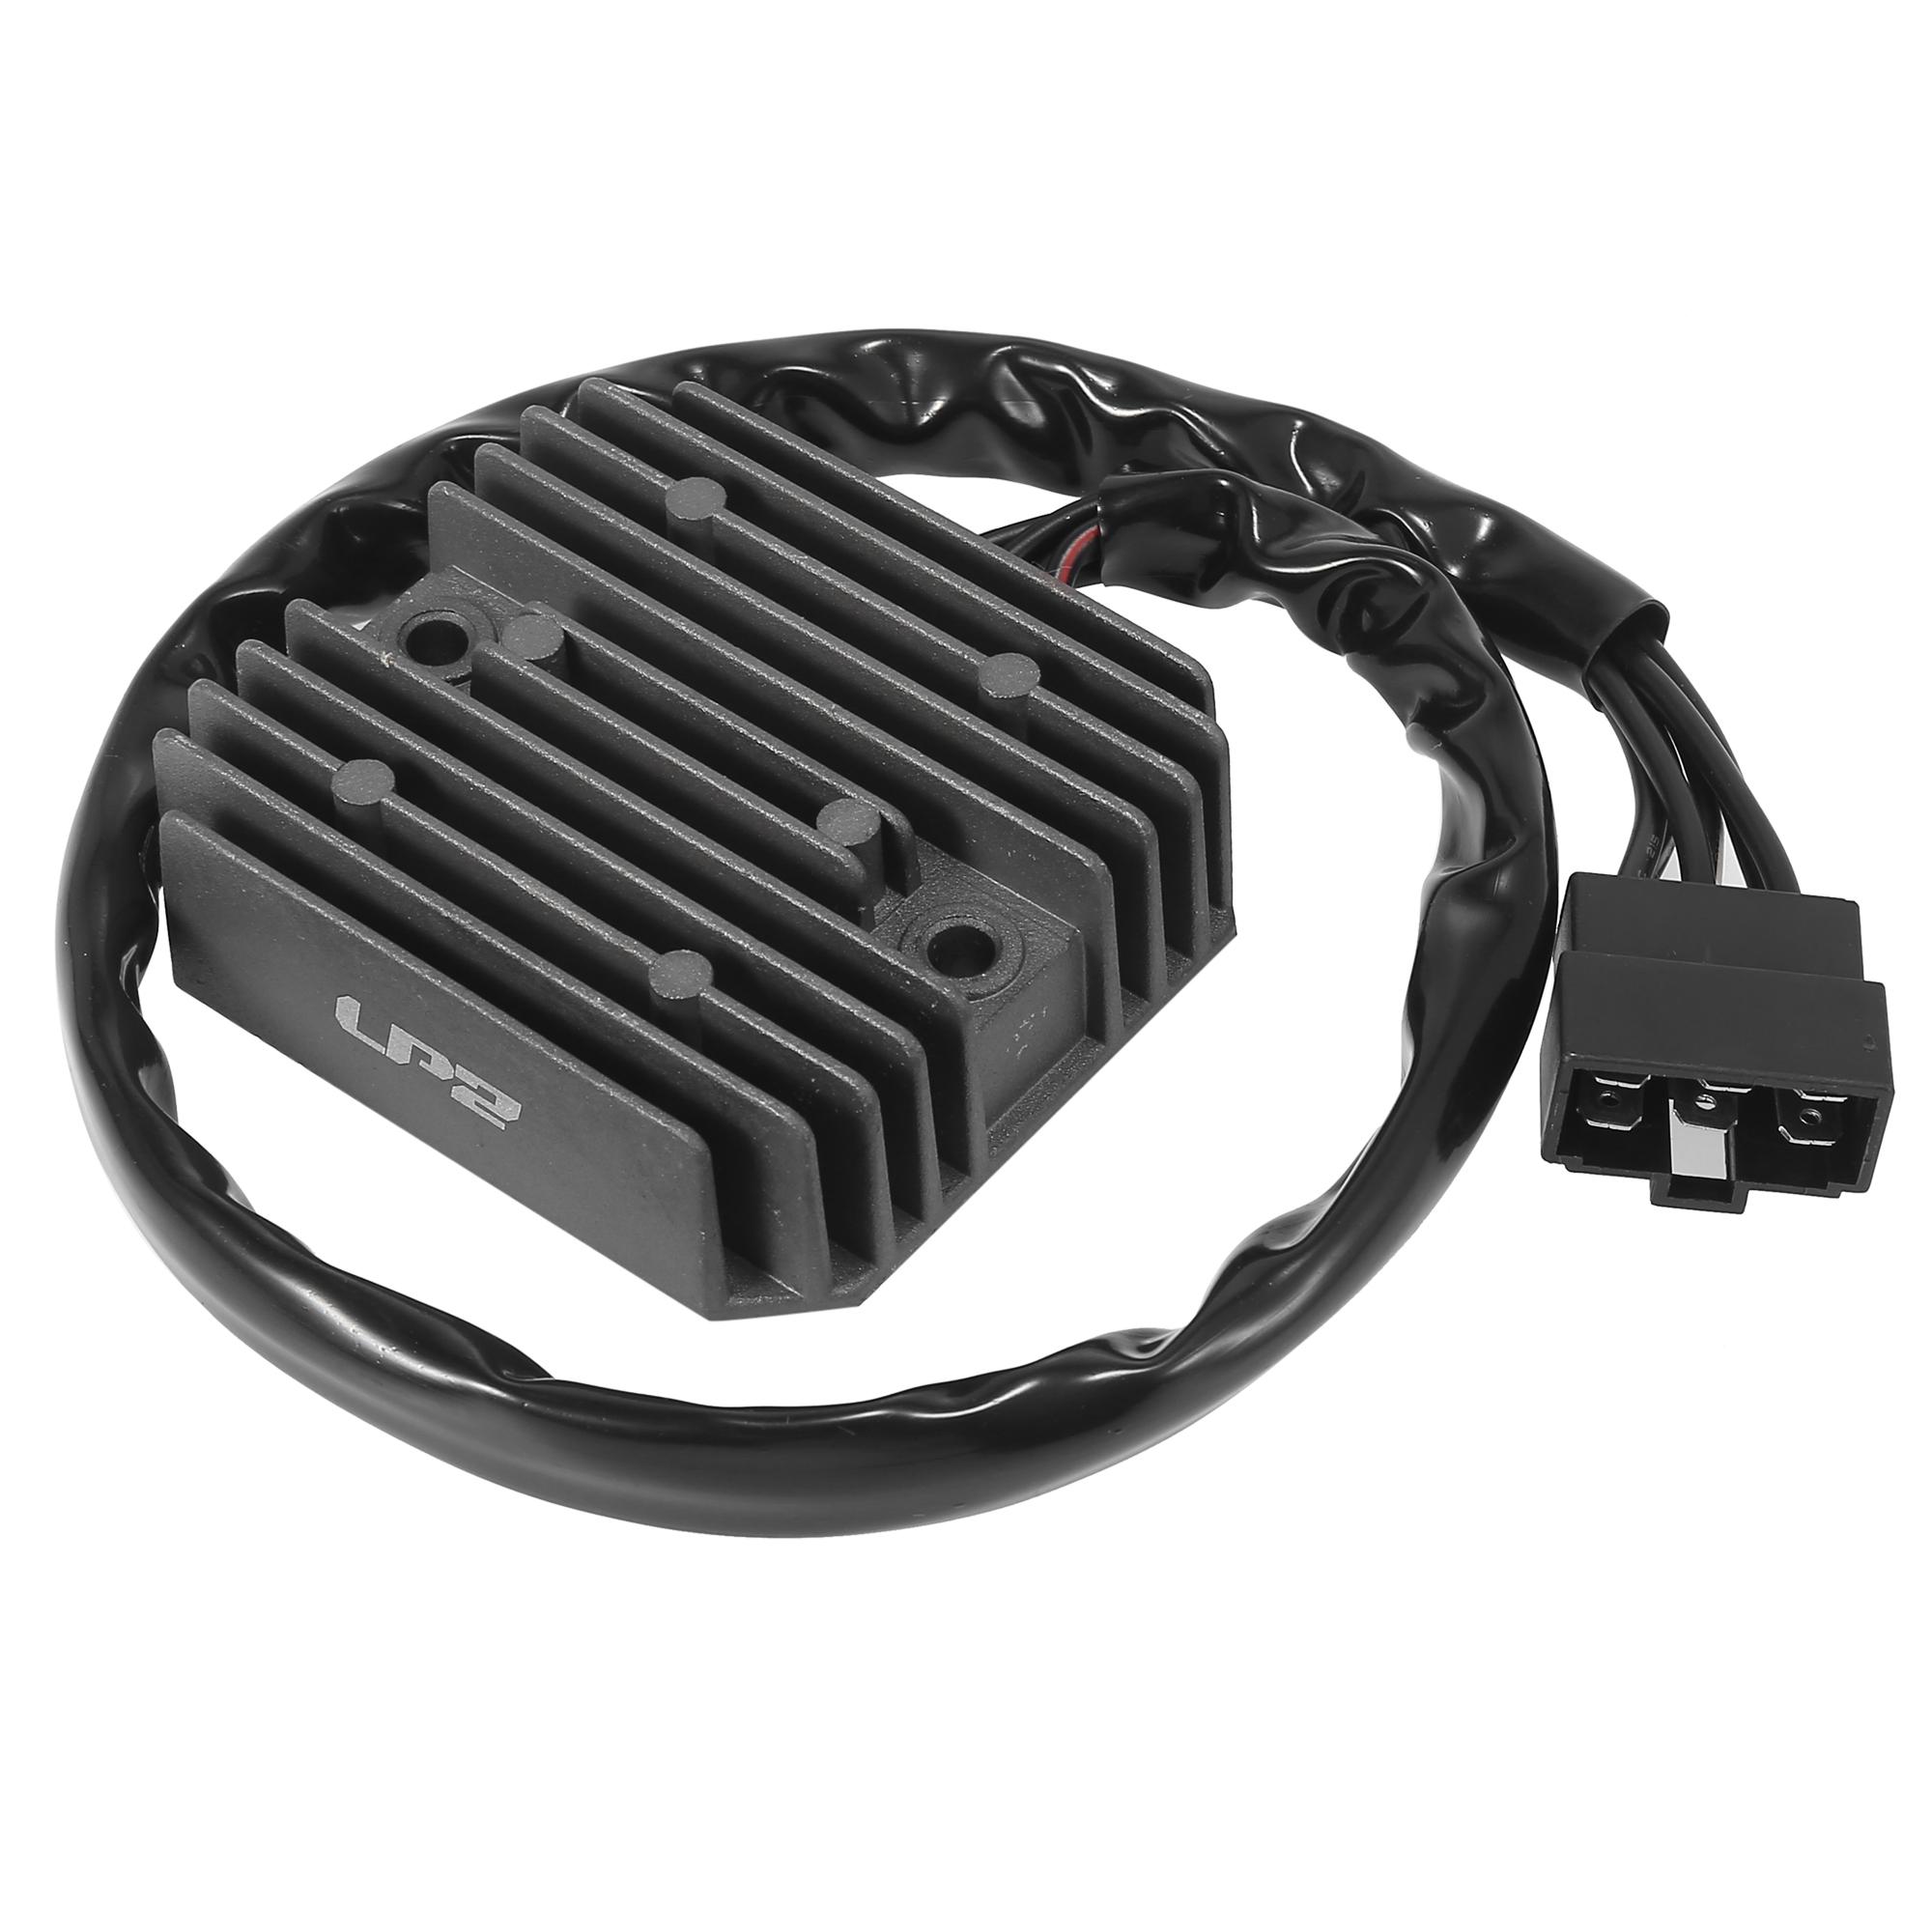 Motorcycle Voltage Regulator Rectifier for Kawasaki VN400 VN800 VN1500 VN1600